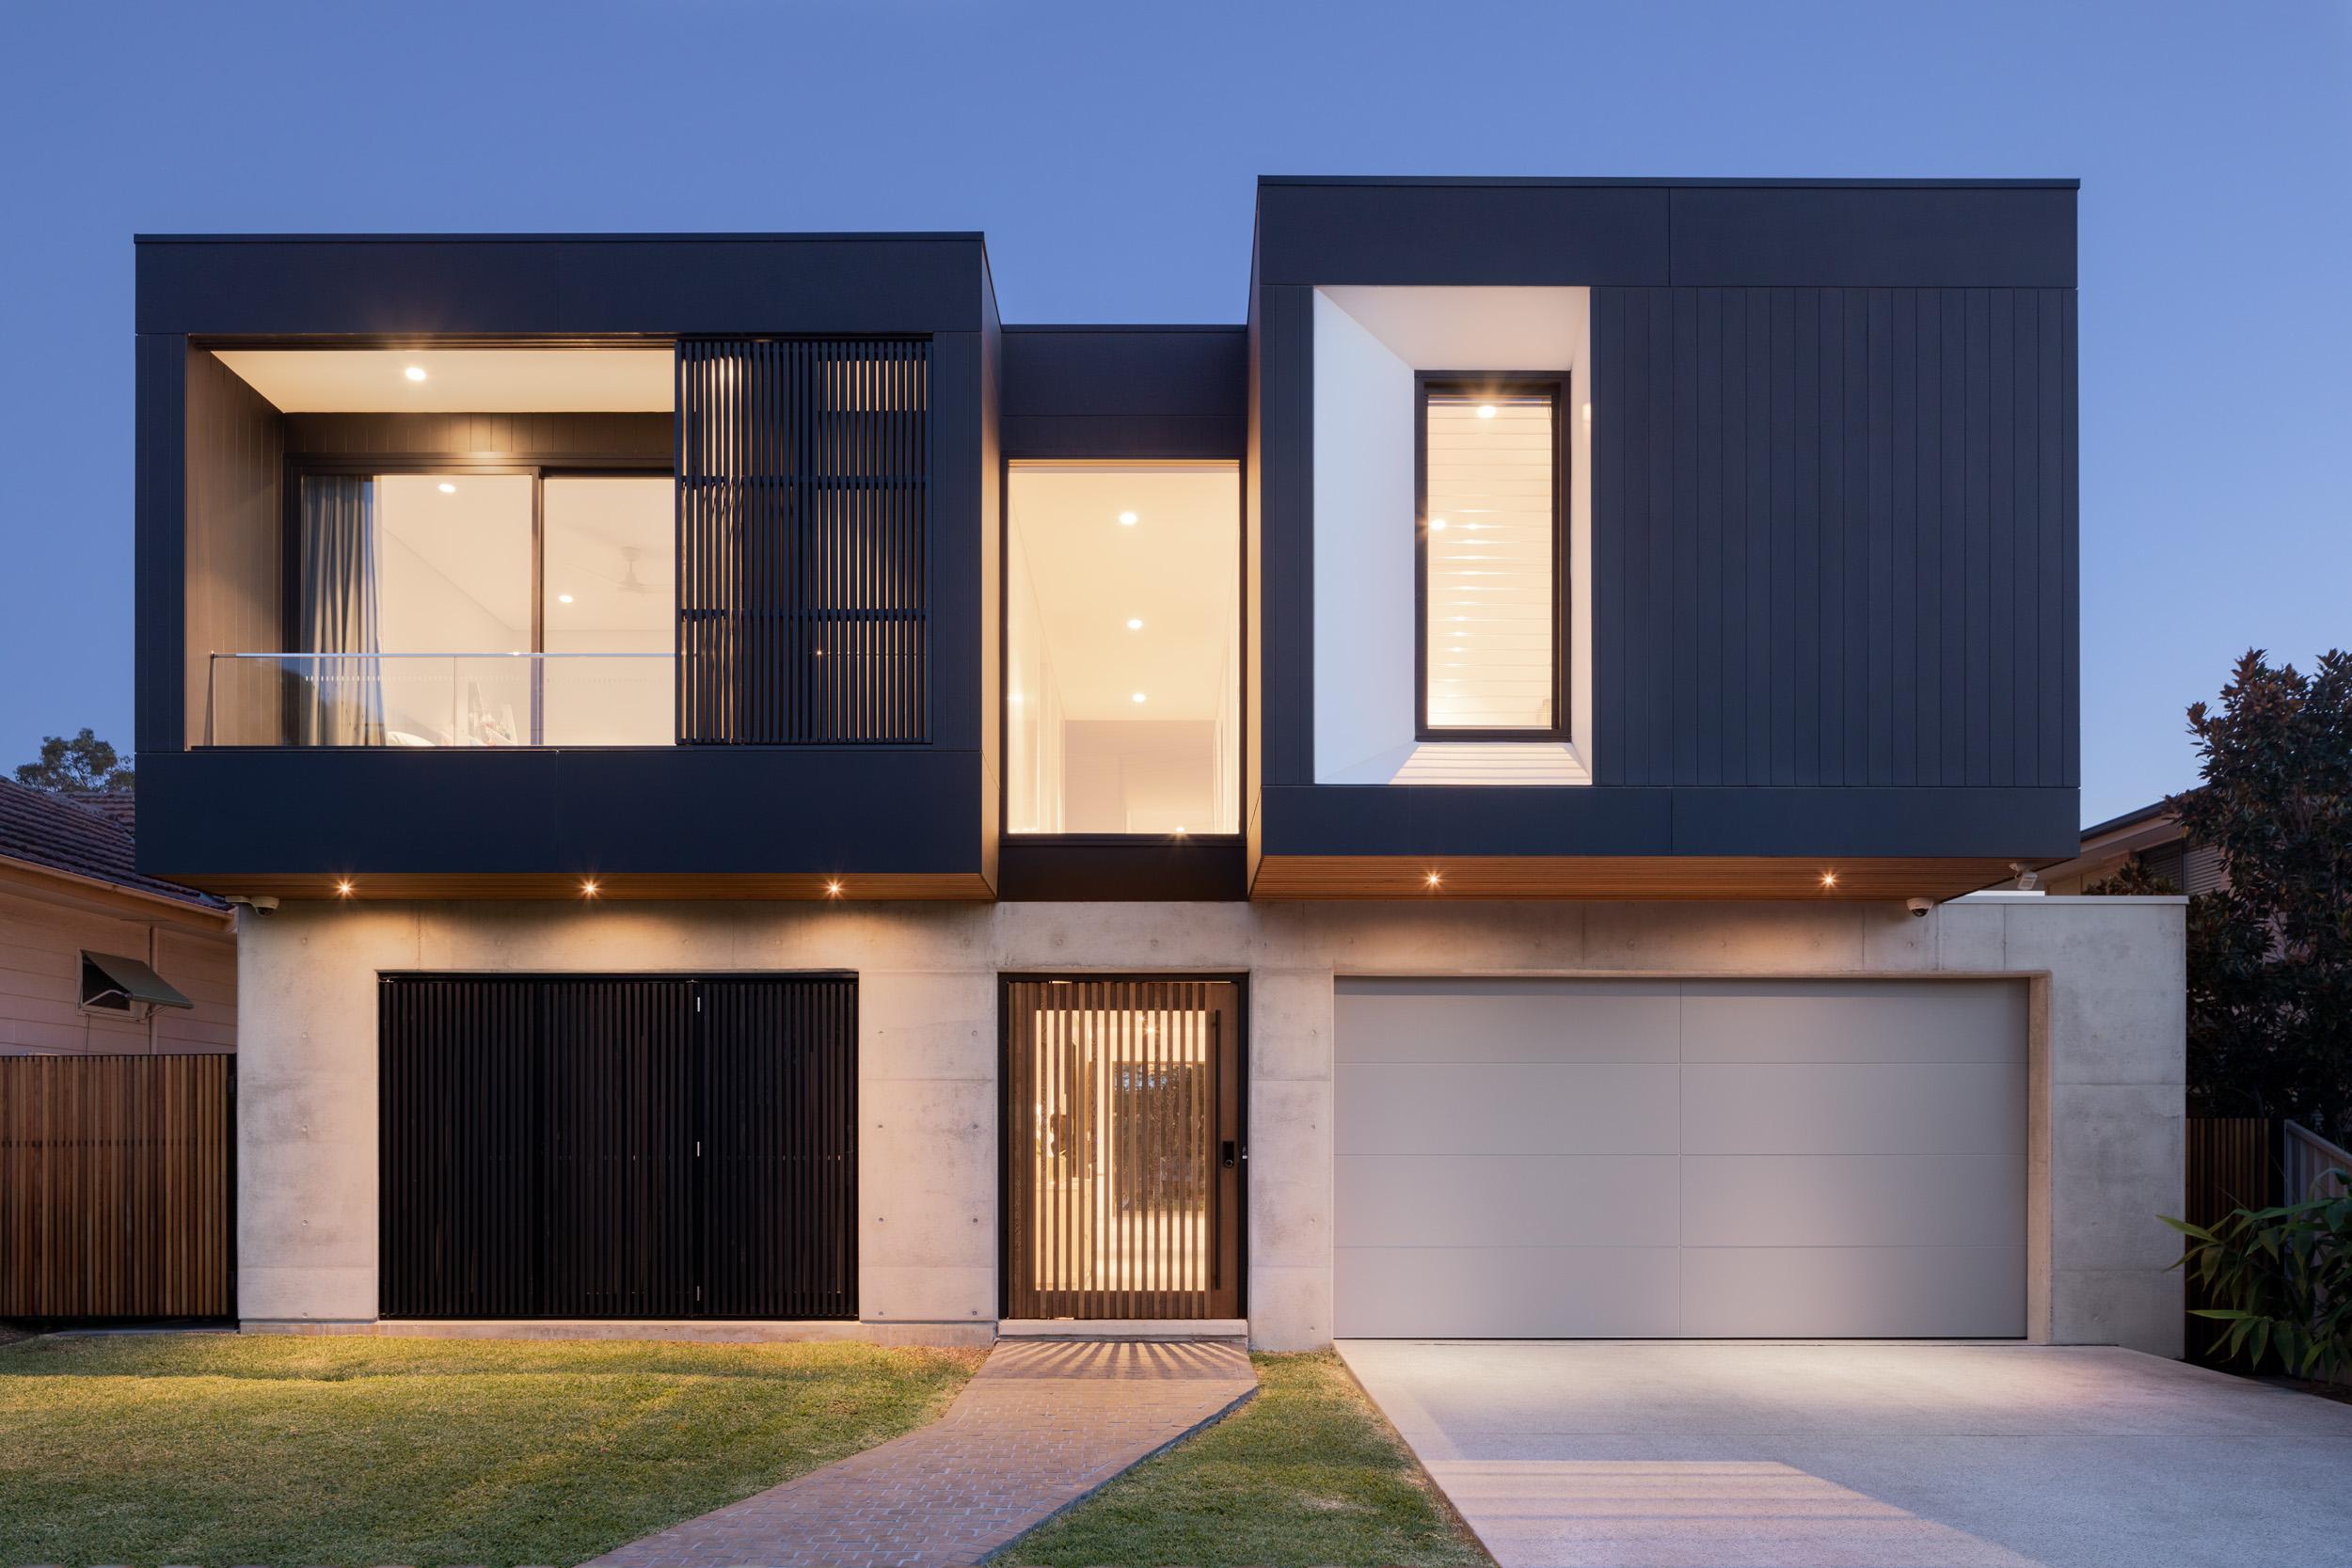 Jem_Cresswell_Architecture_Residential_Photographer_Sydney_Australia_005.jpg